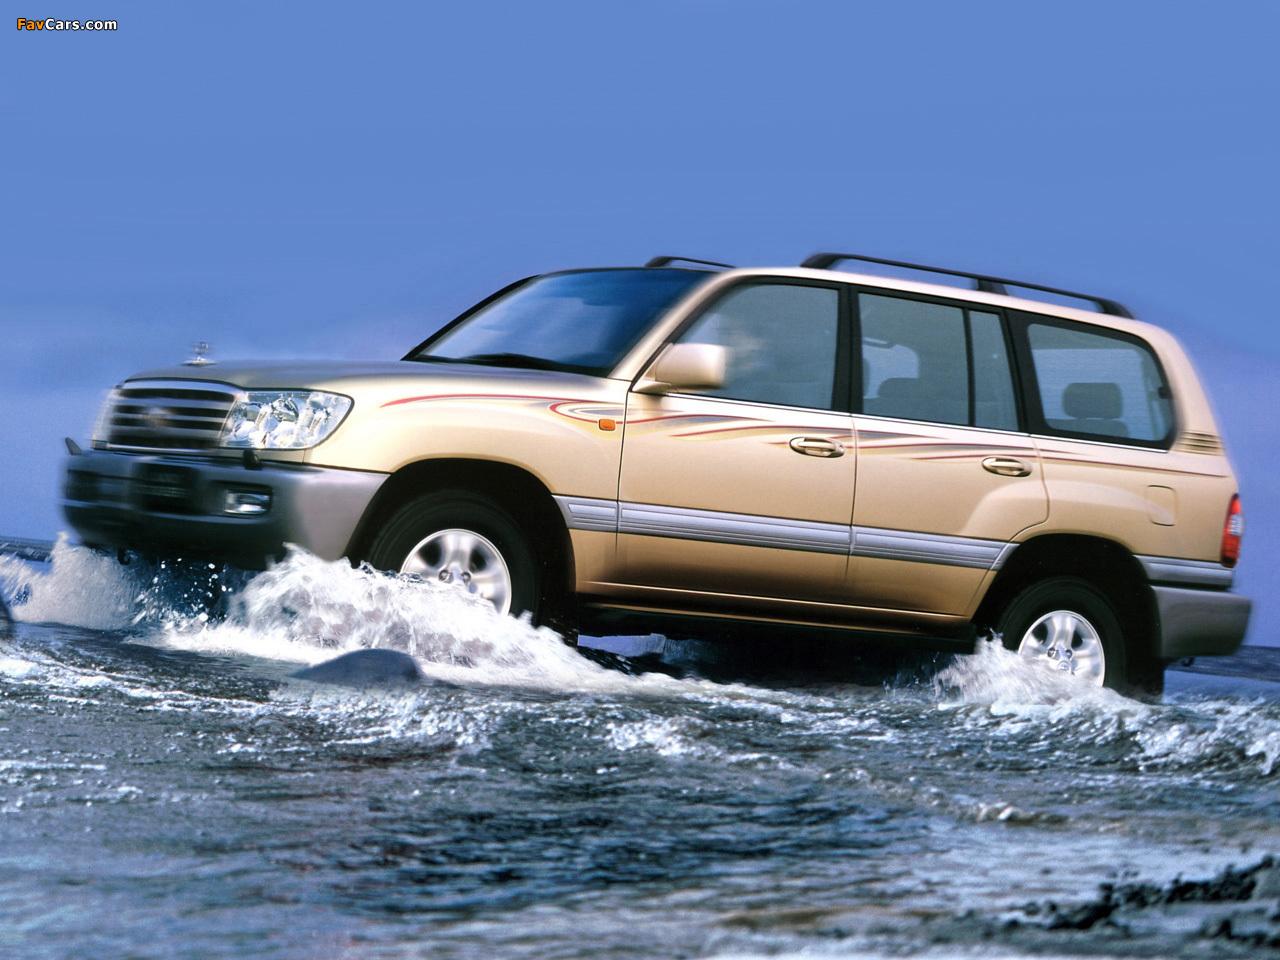 Pictures Of Toyota Land Cruiser 100 Vx R Cn Spec J100 101